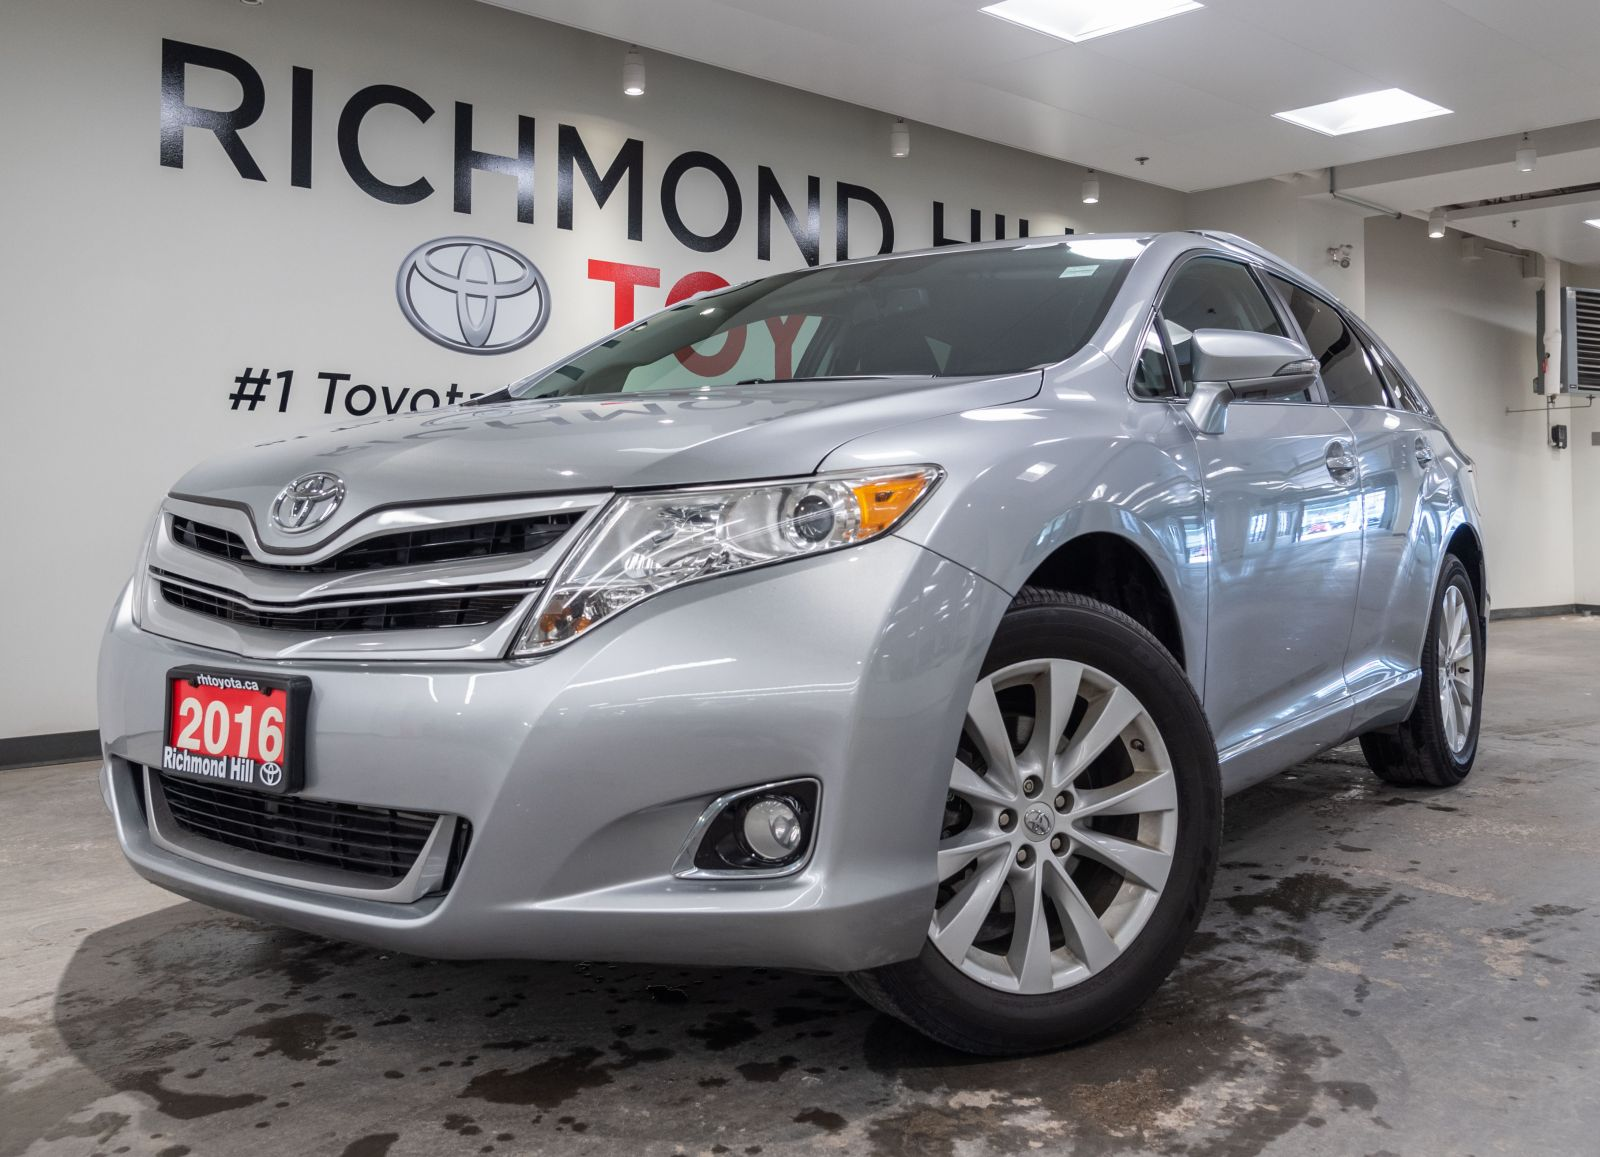 2016 Toyota Venza Image